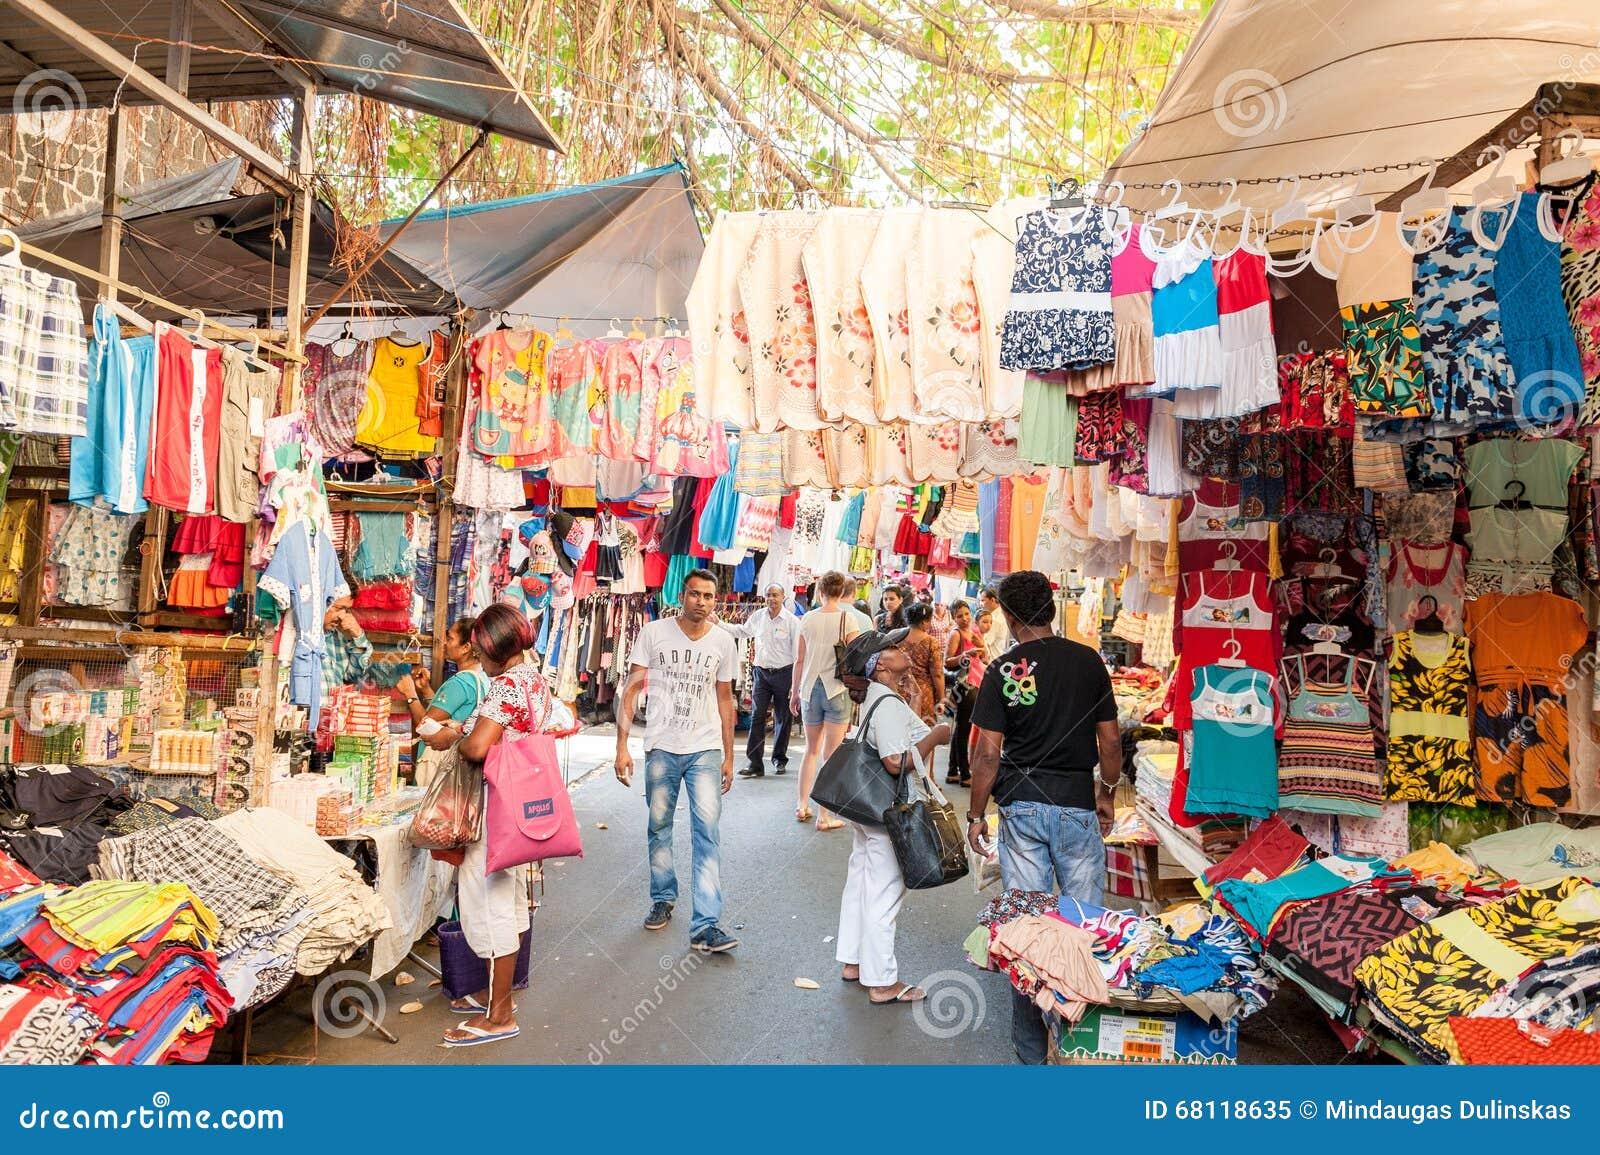 Port louis mauritius october 01 2015 market street in port louis mautirius people are - Mauritius market port louis ...